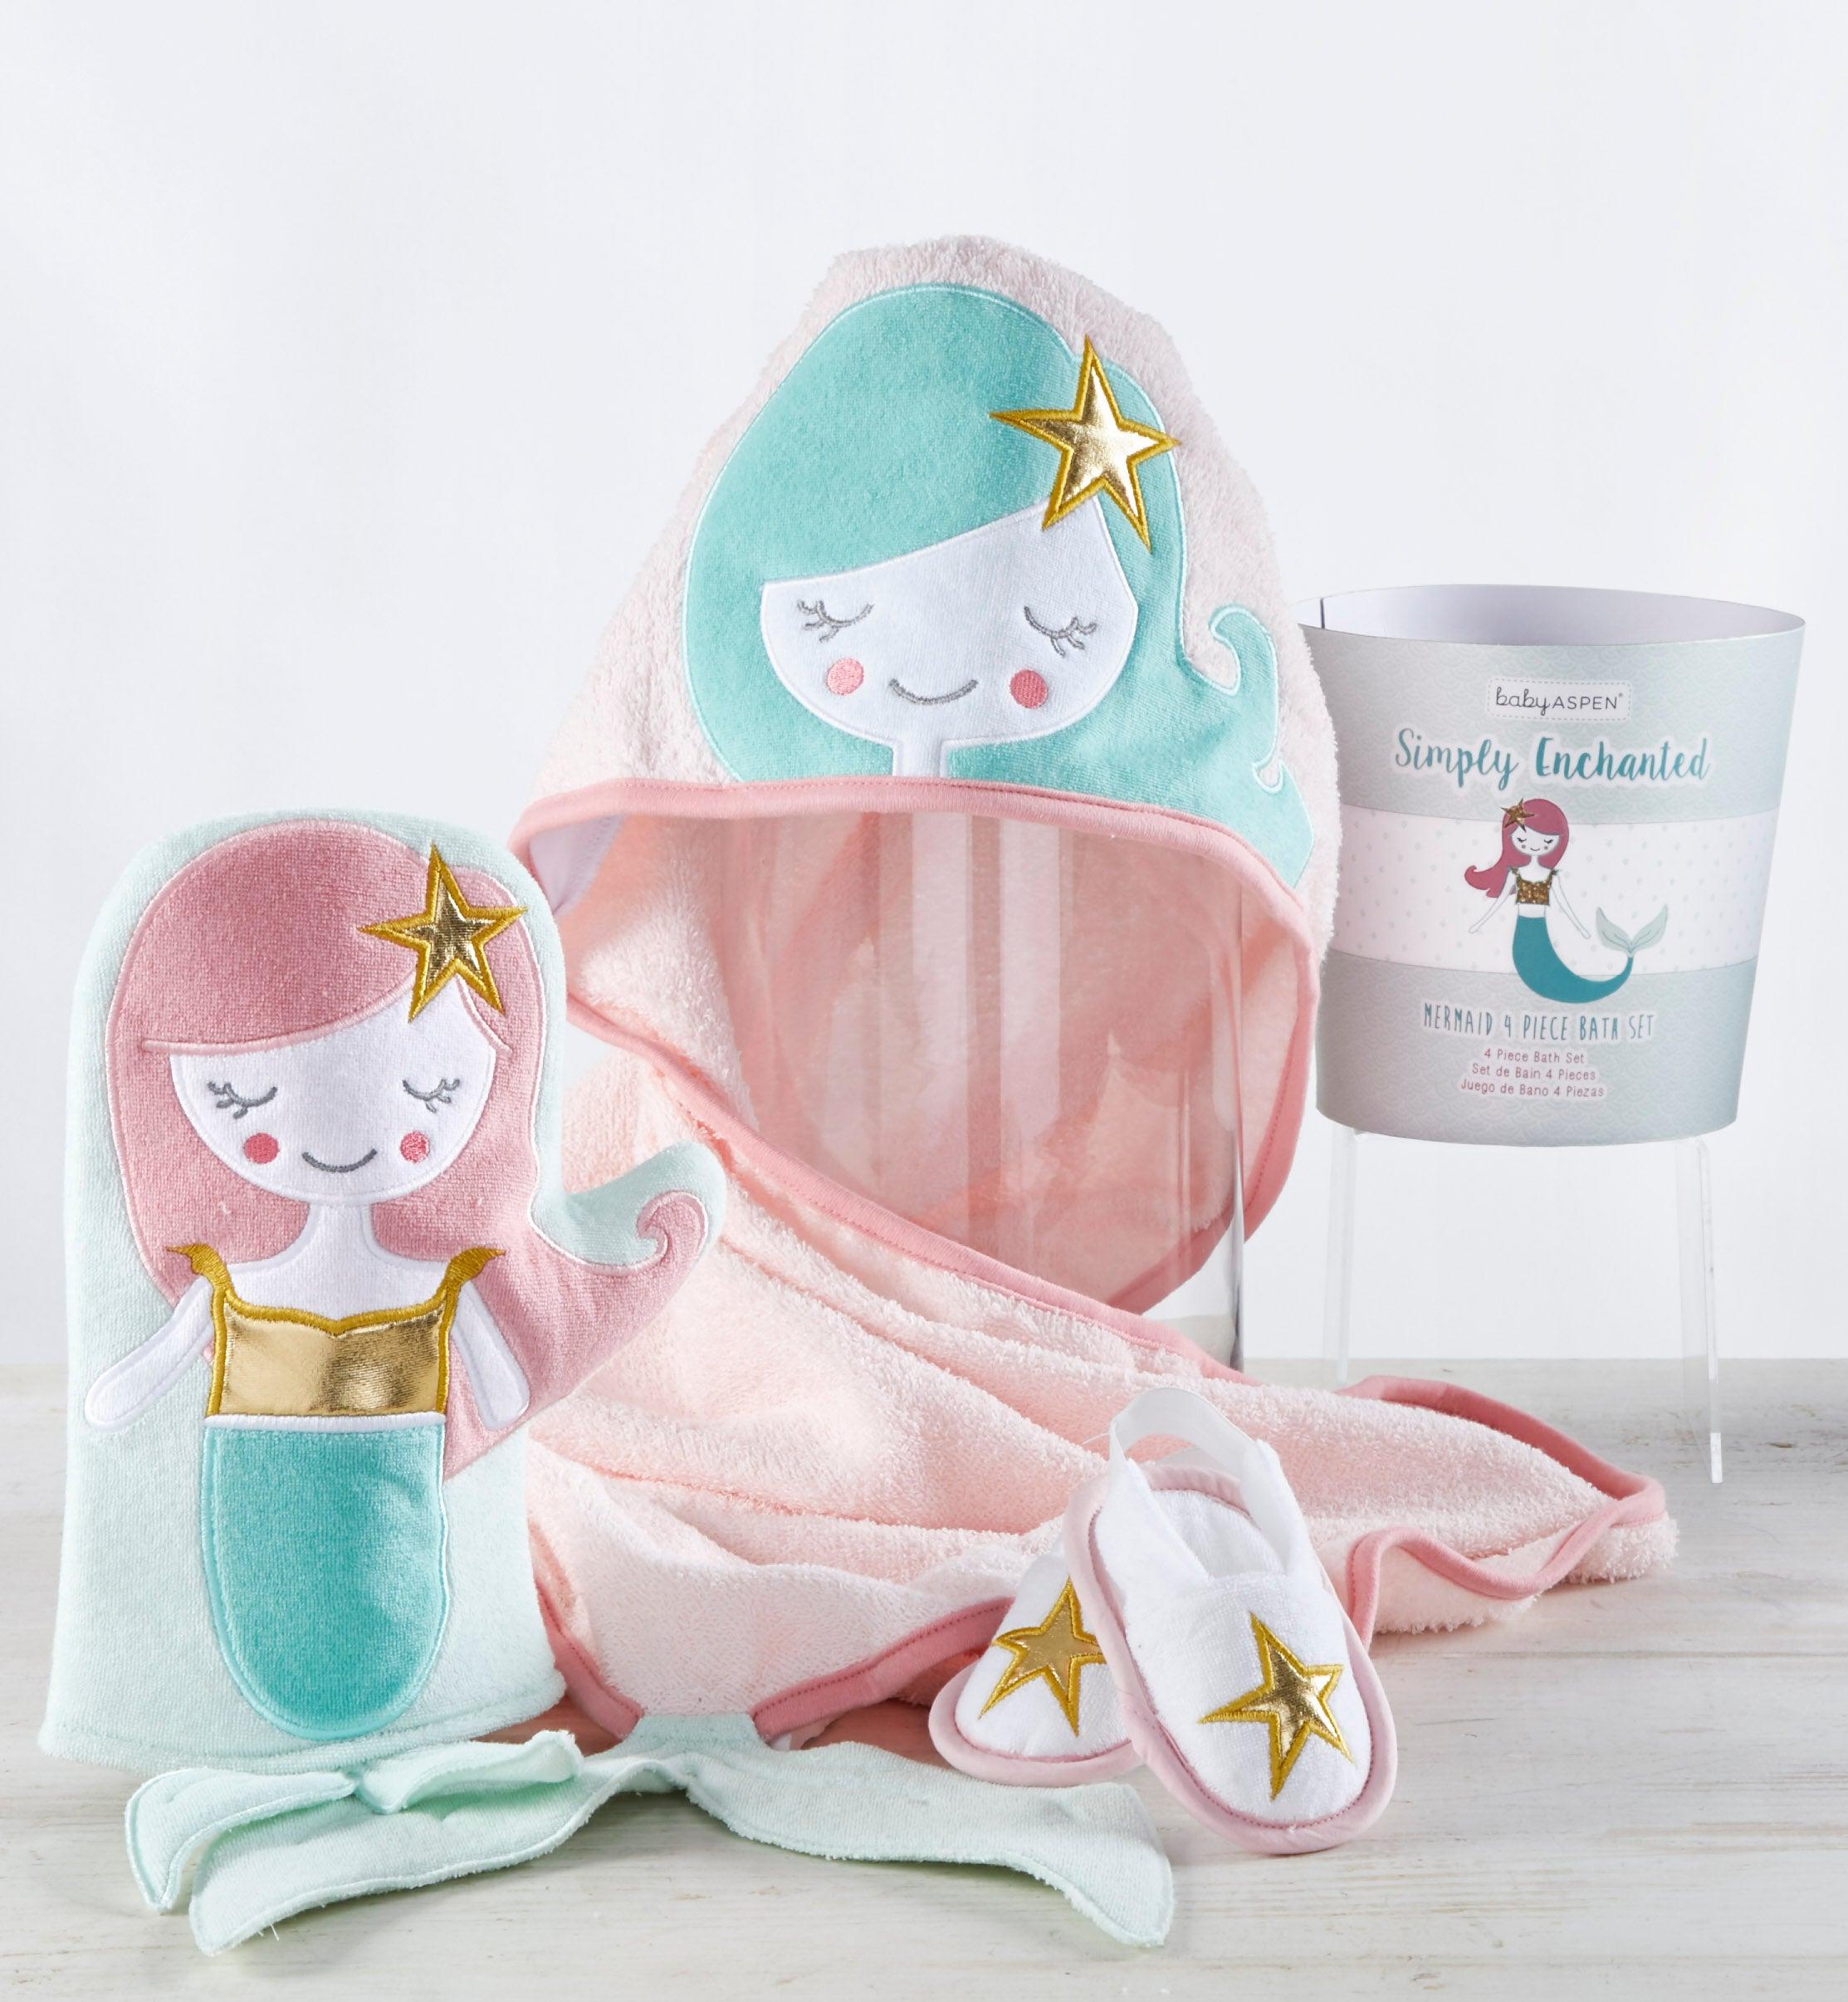 Simply Enchanted Mermaid pc Bathtime Gift Set